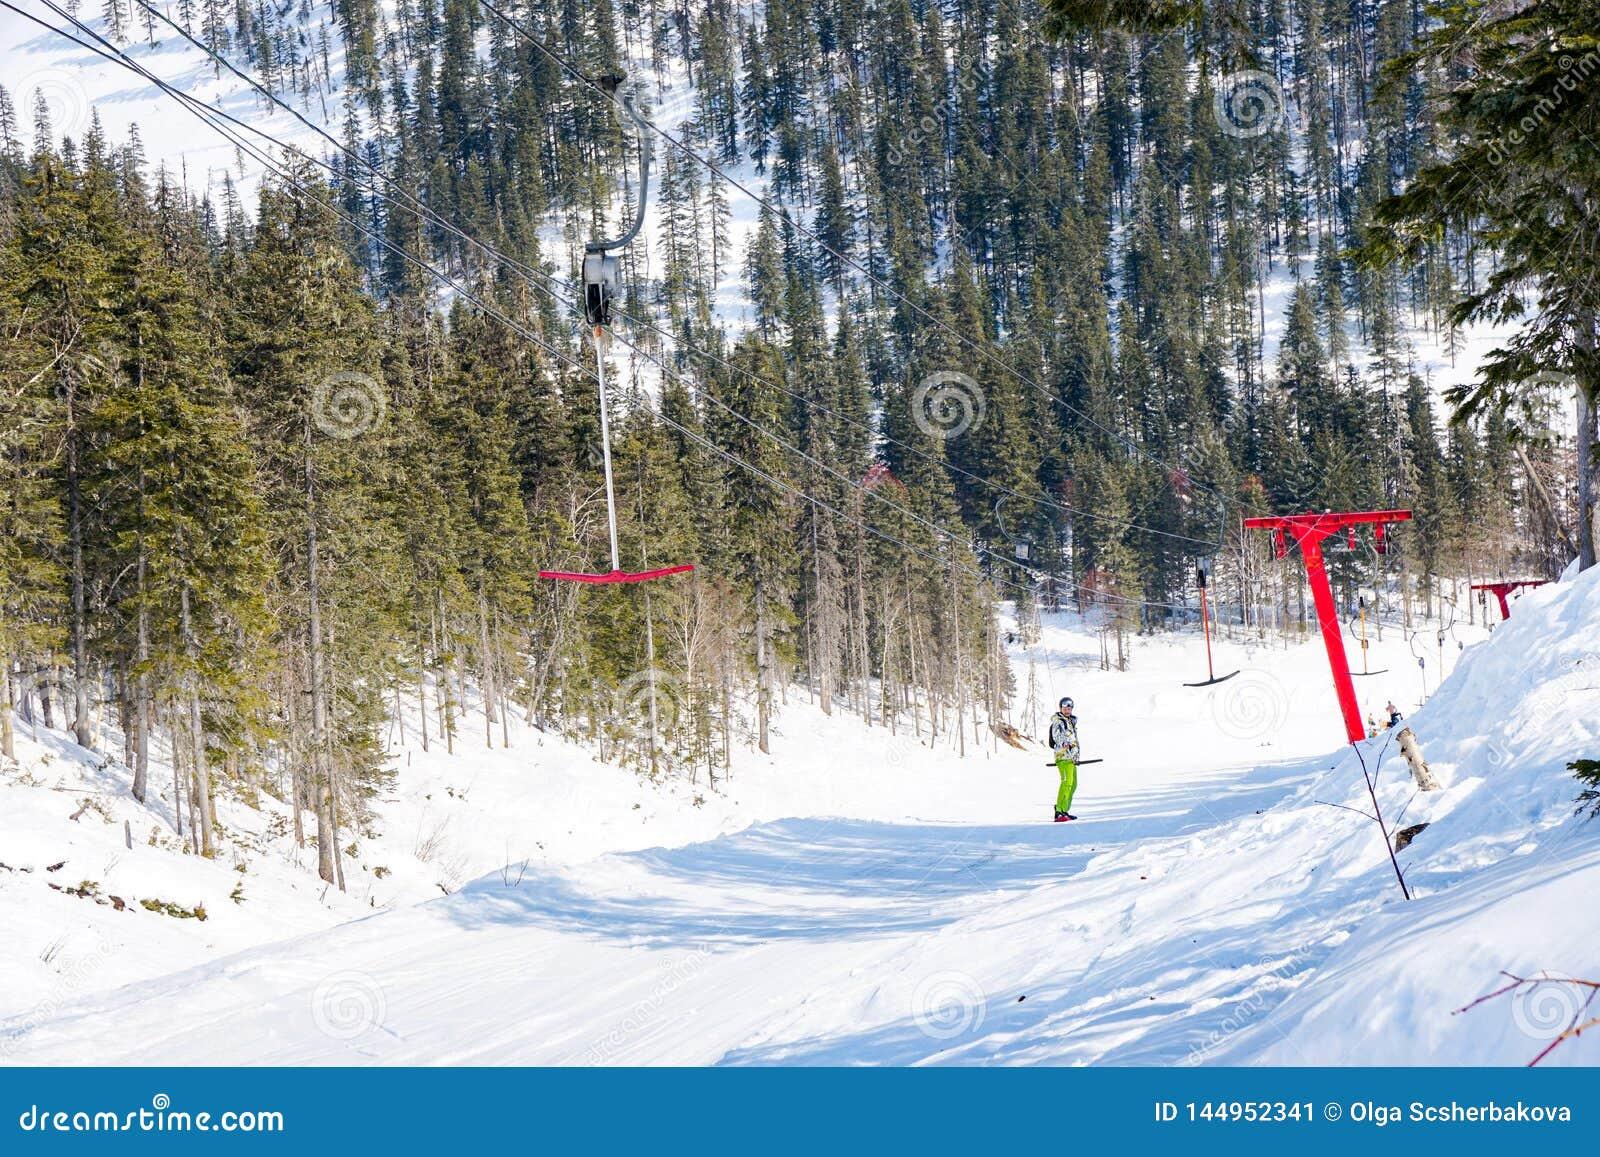 Rope tow at a ski resort